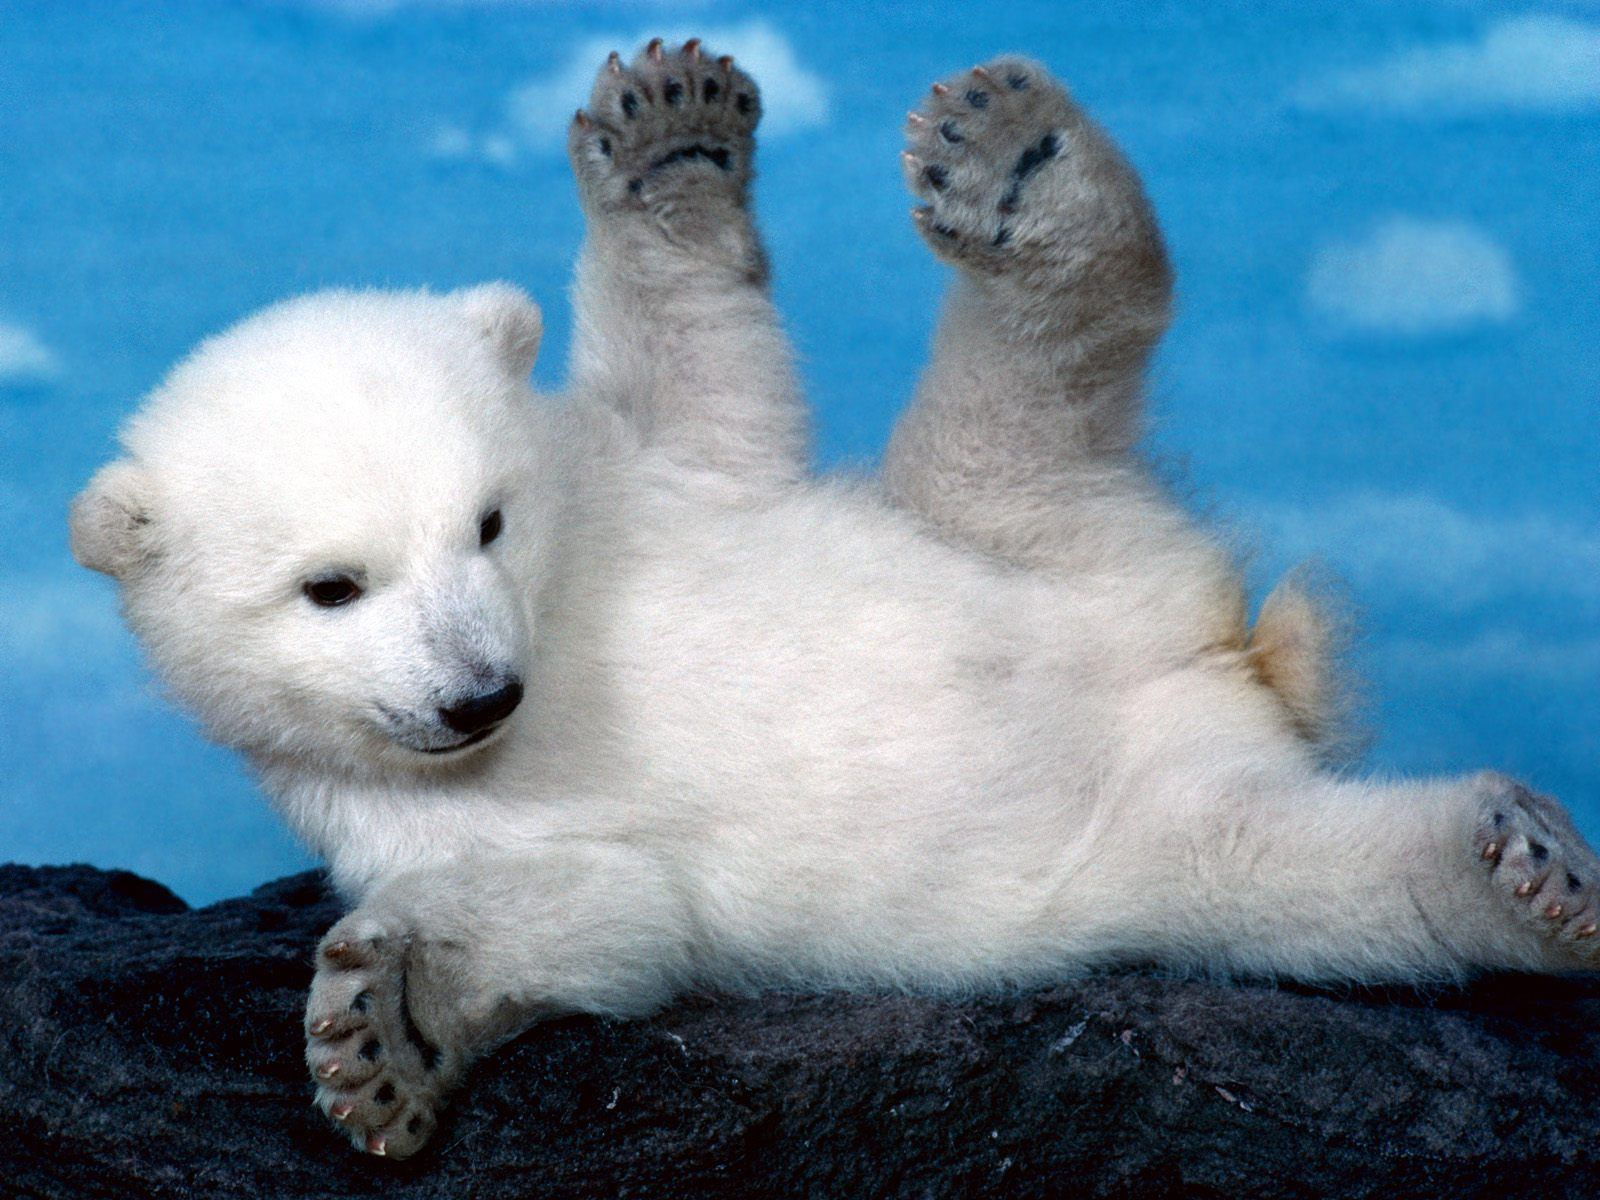 http://2.bp.blogspot.com/-QSg2tHPh_WU/T4adwZth5xI/AAAAAAAAAEs/ezbiCM24Bik/s1600/White+Polar+Bear+Cub.jpg